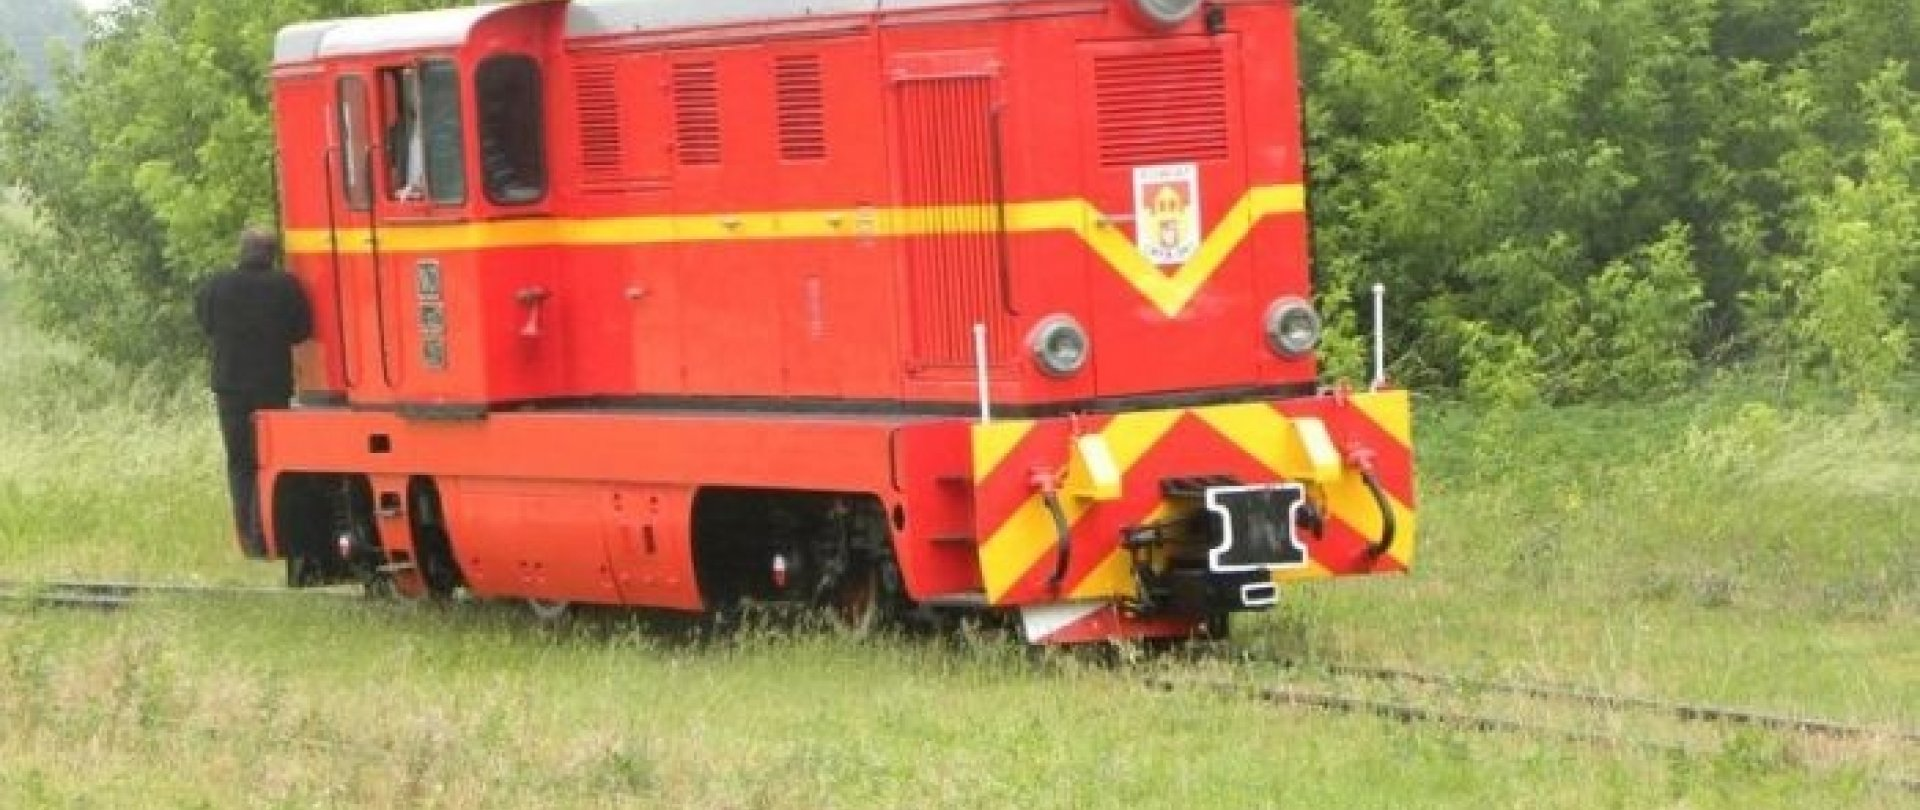 Vistula River Narrow-Gauge Railway Tour